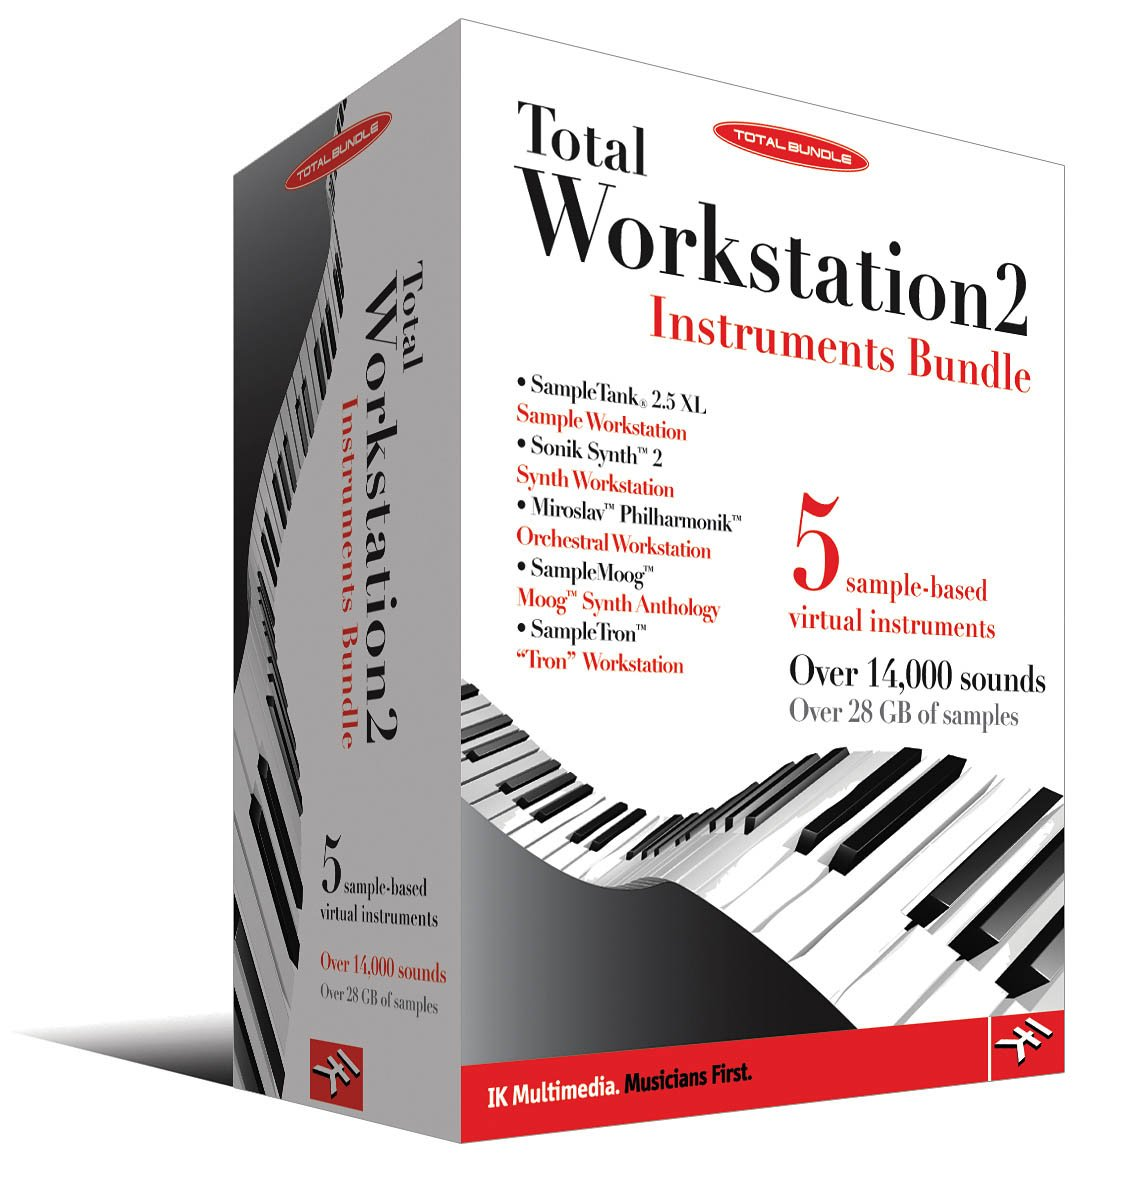 IK Mulitmedia Total Workstation 2-Instruments Bundle